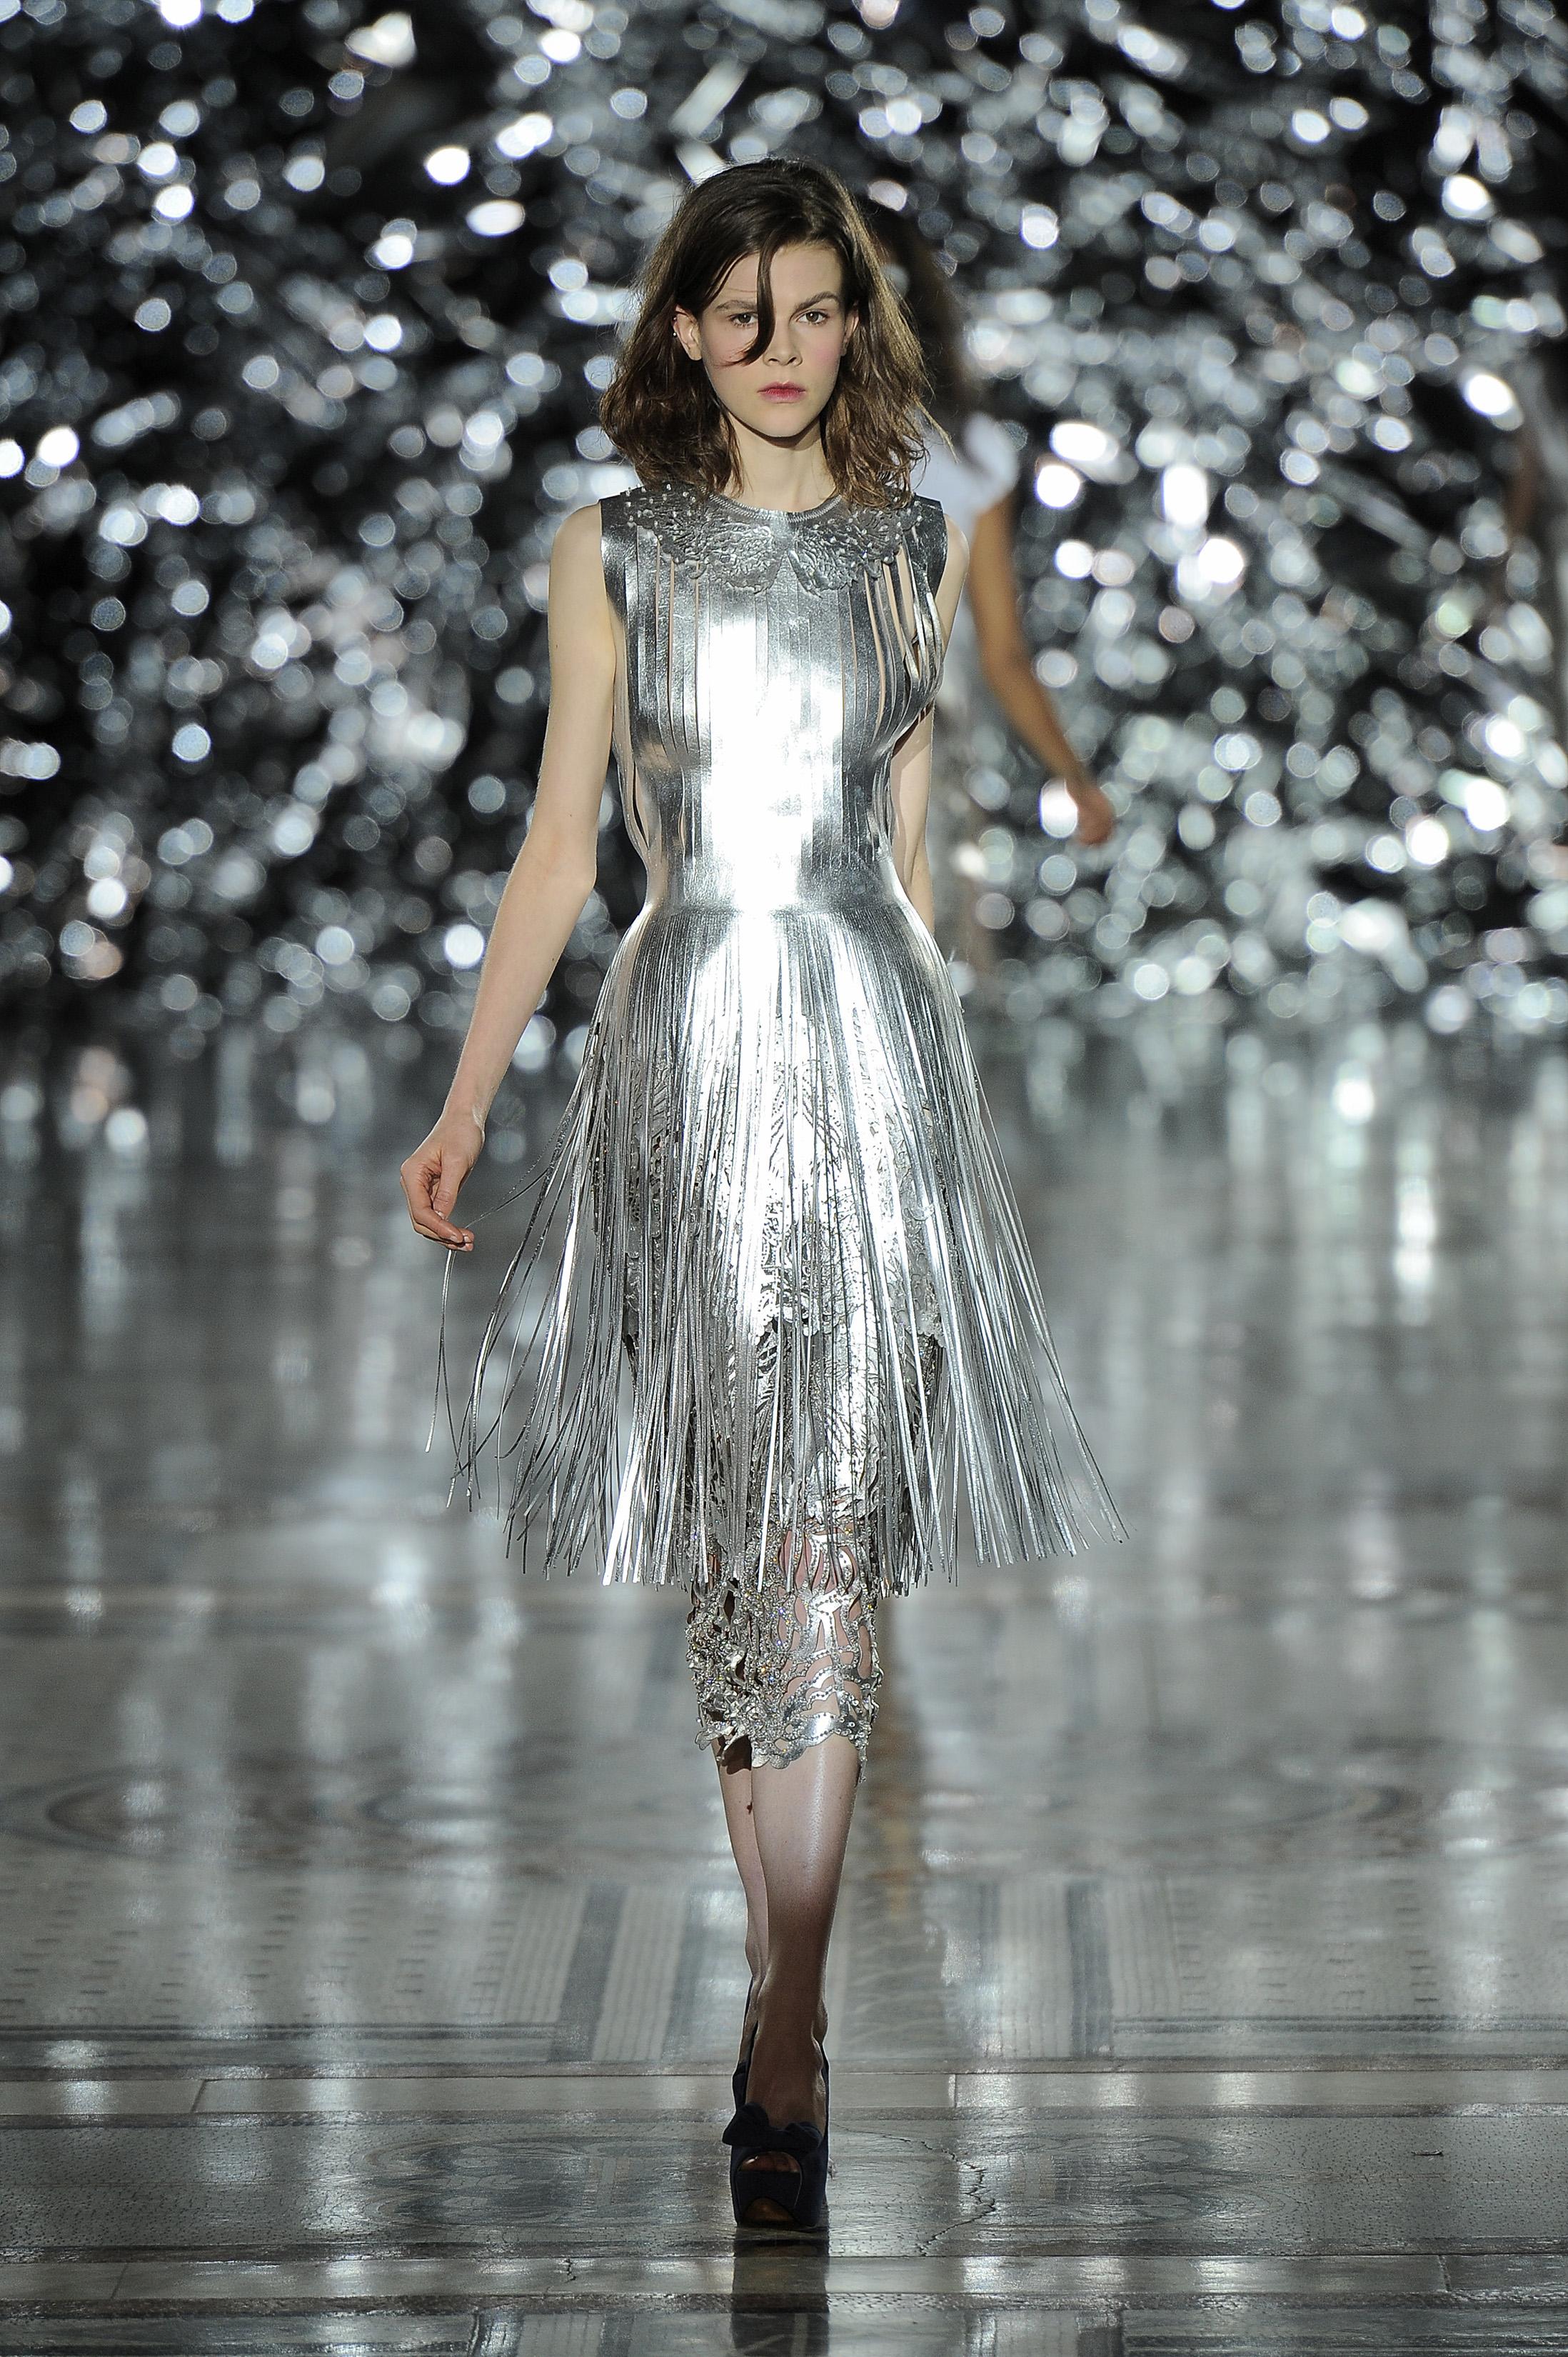 Vestido de couro metálico com franjas. Design: Giles Deacon, 2014. Couro, cristais Swarovski